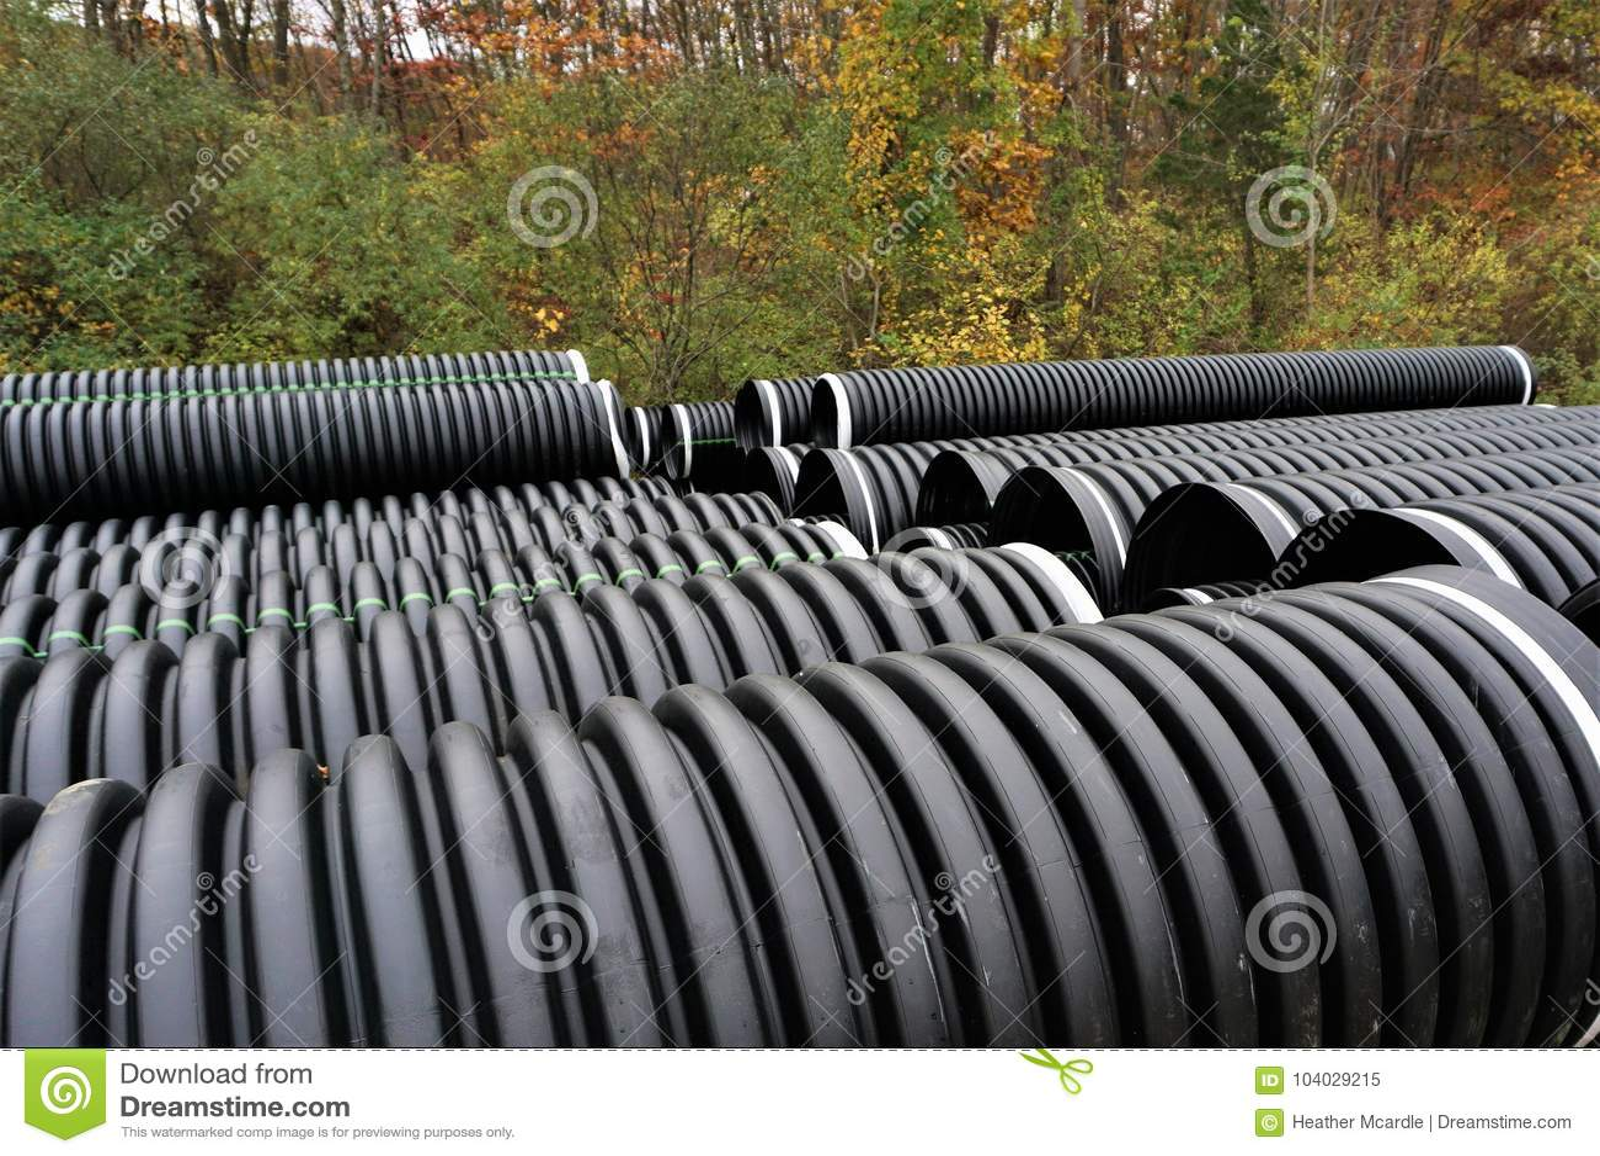 Black Plastic Curvilinear Pvc Pipe Stock Image Image Of